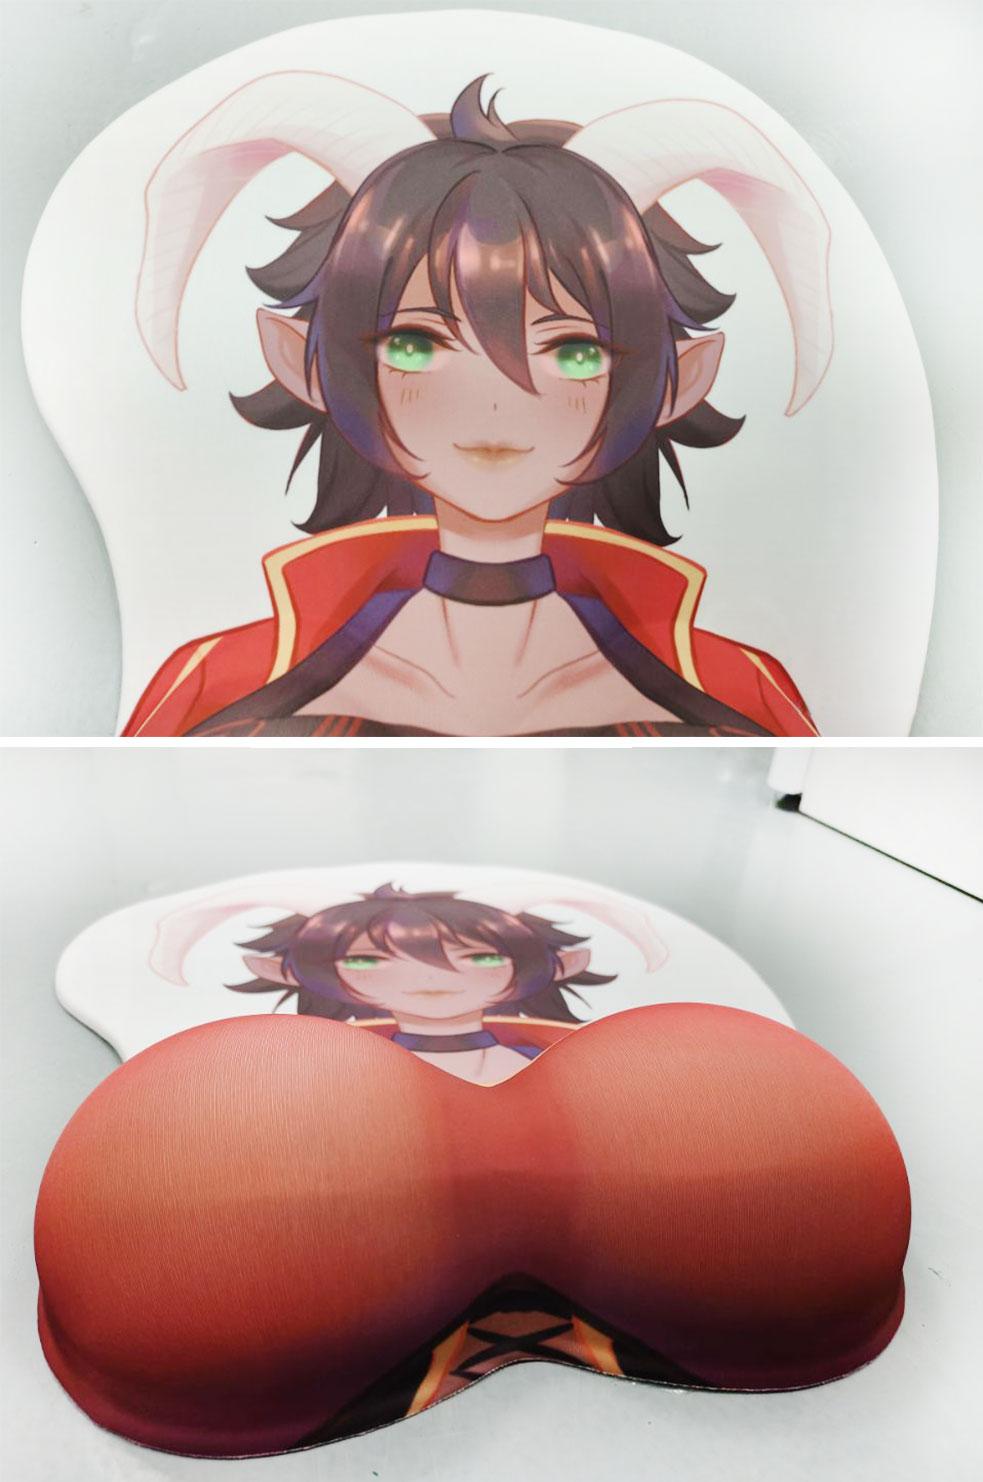 kamado nezuko life size oppai mousepad 4525 - Anime Mousepads